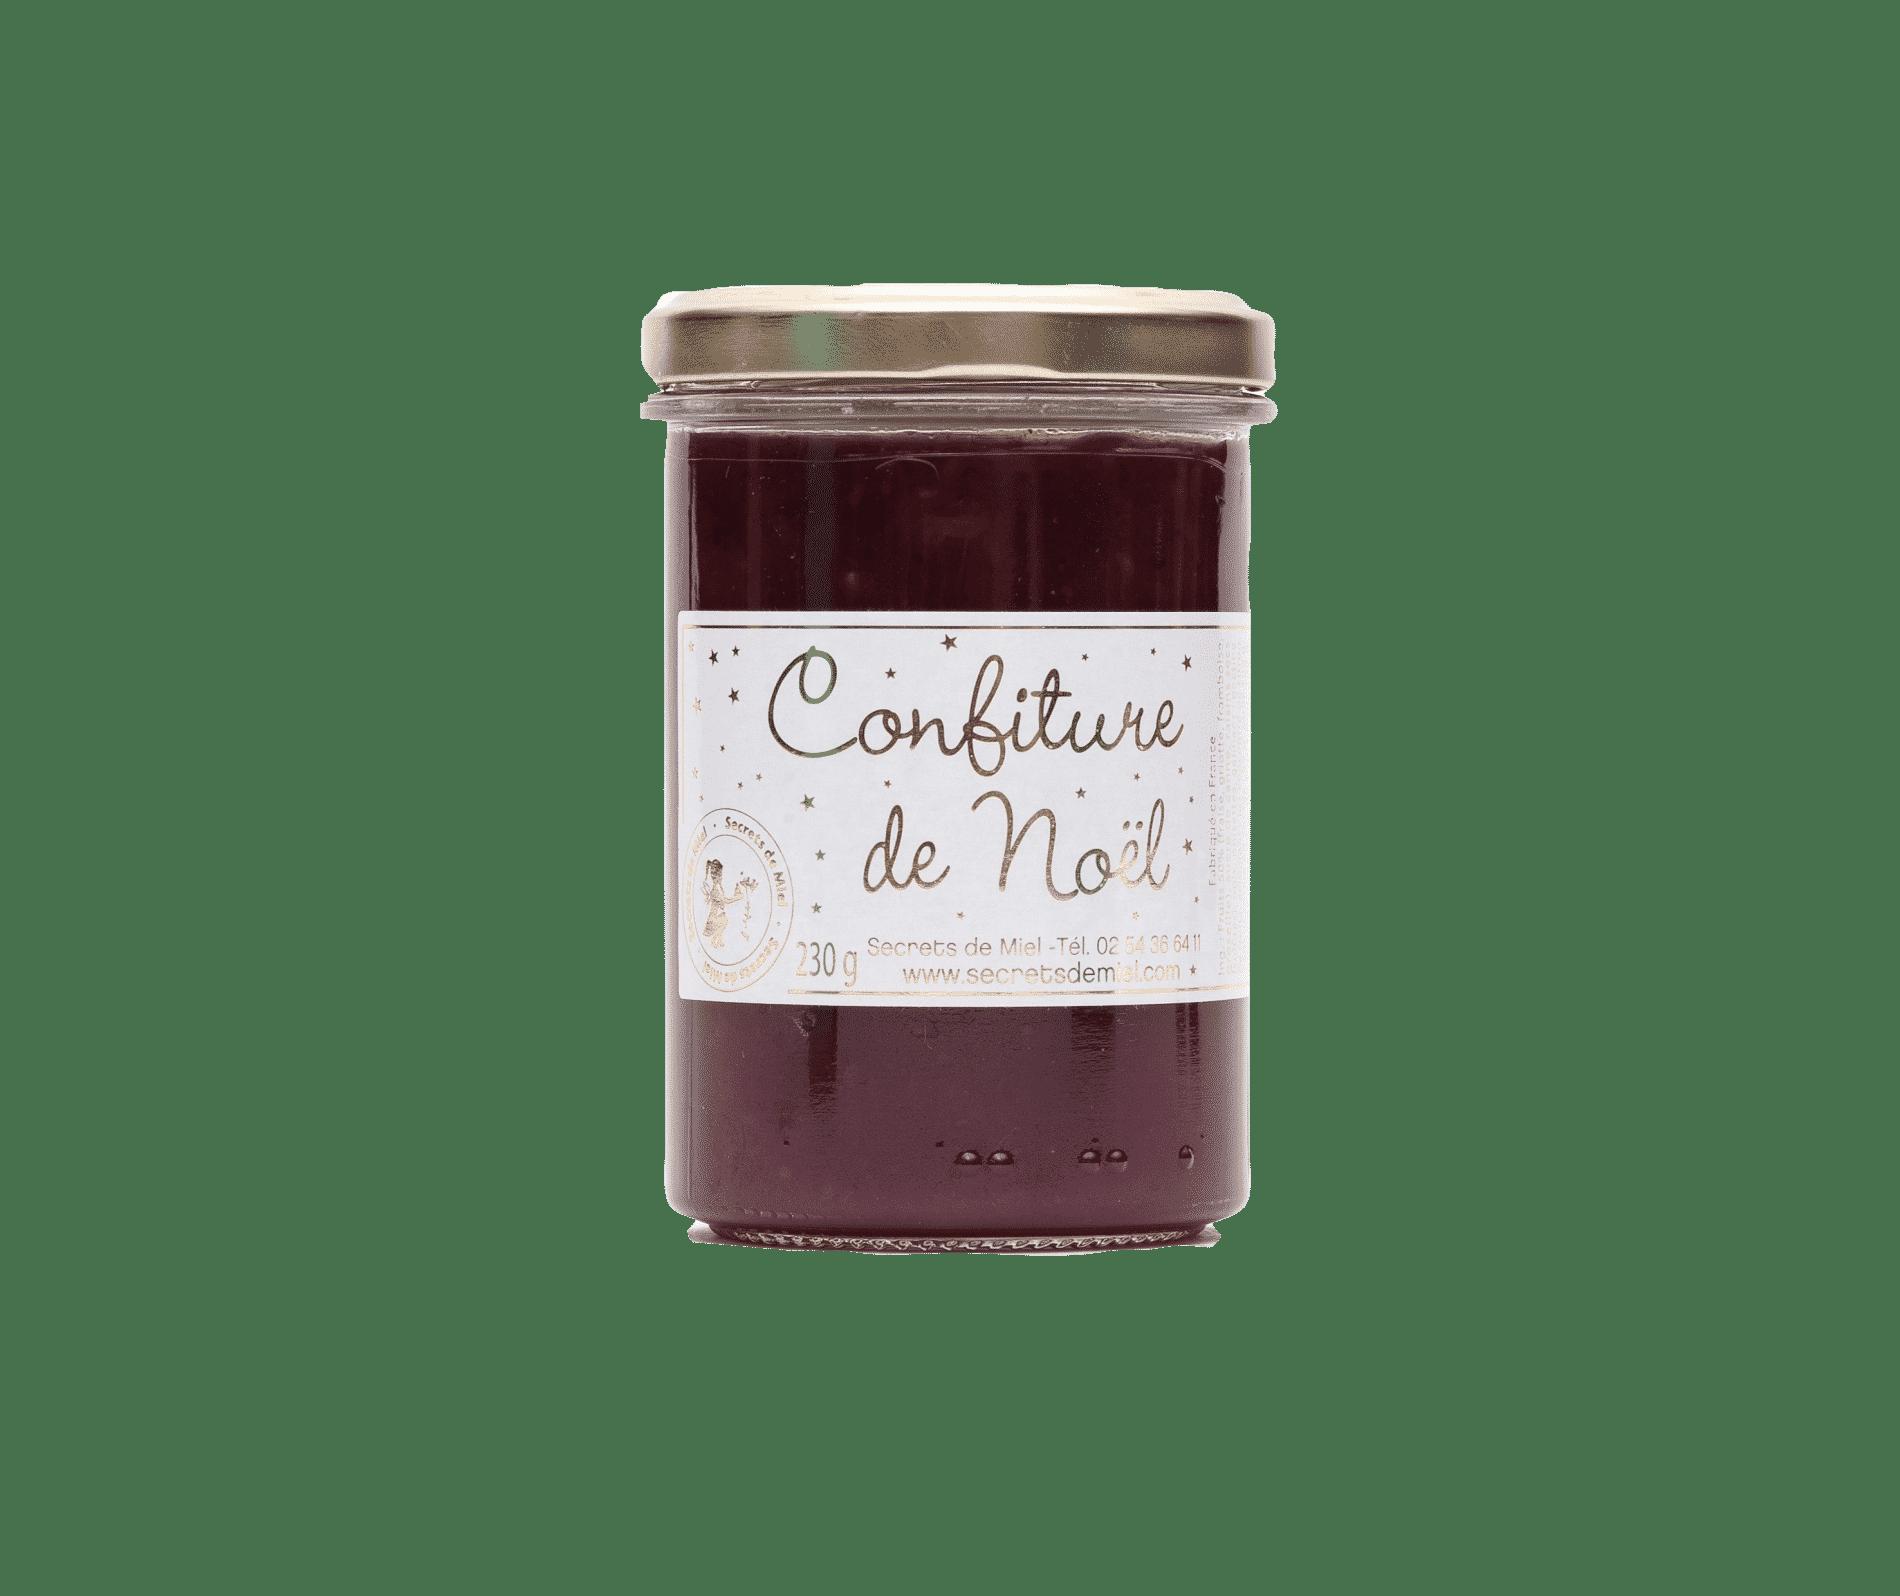 confiture - fruits rouges - artisanale - made in France - Secrets de Miel